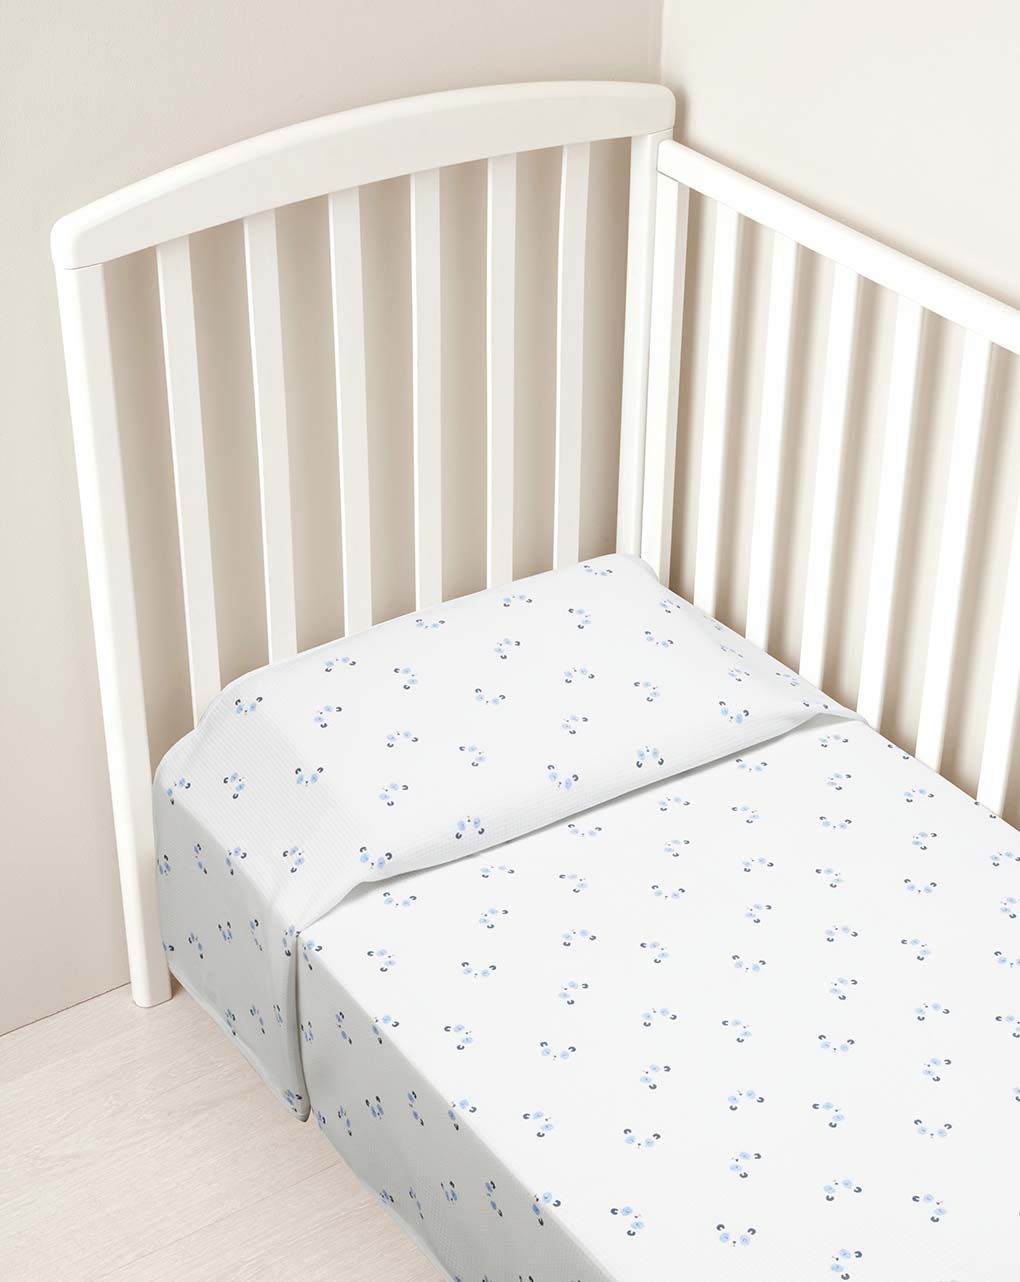 Copertina letto estiva bimbo - Prénatal